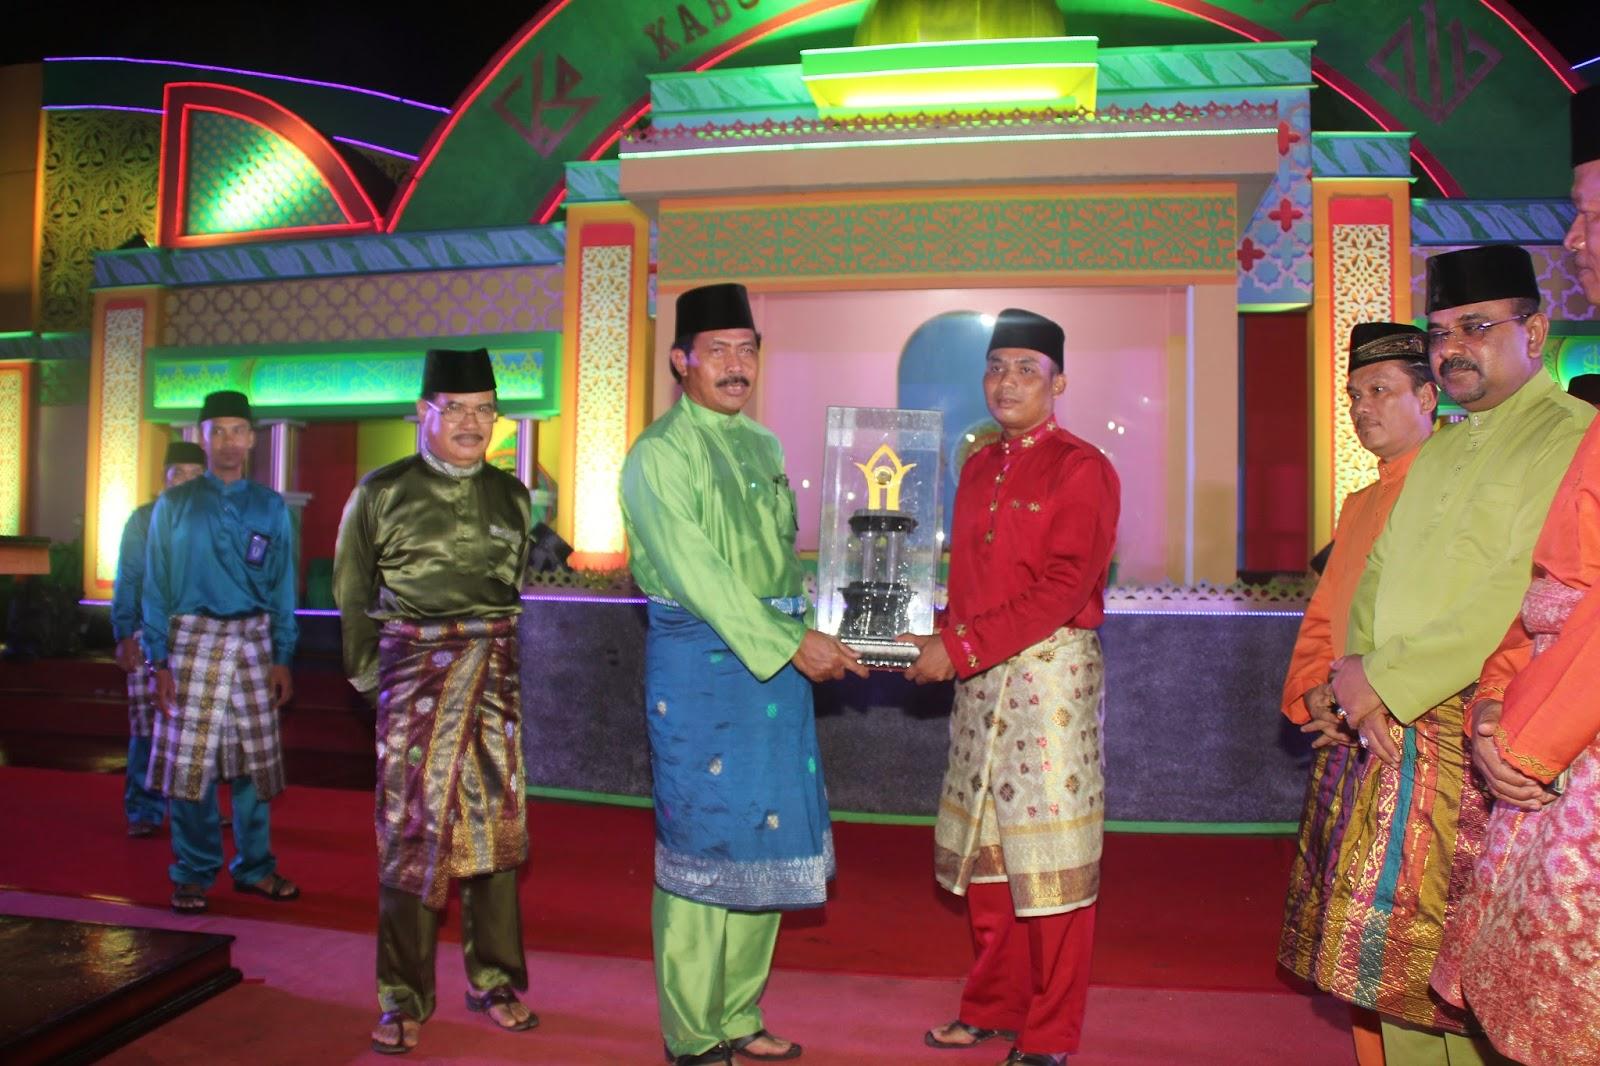 http://kemenagkarimun.blogspot.com/